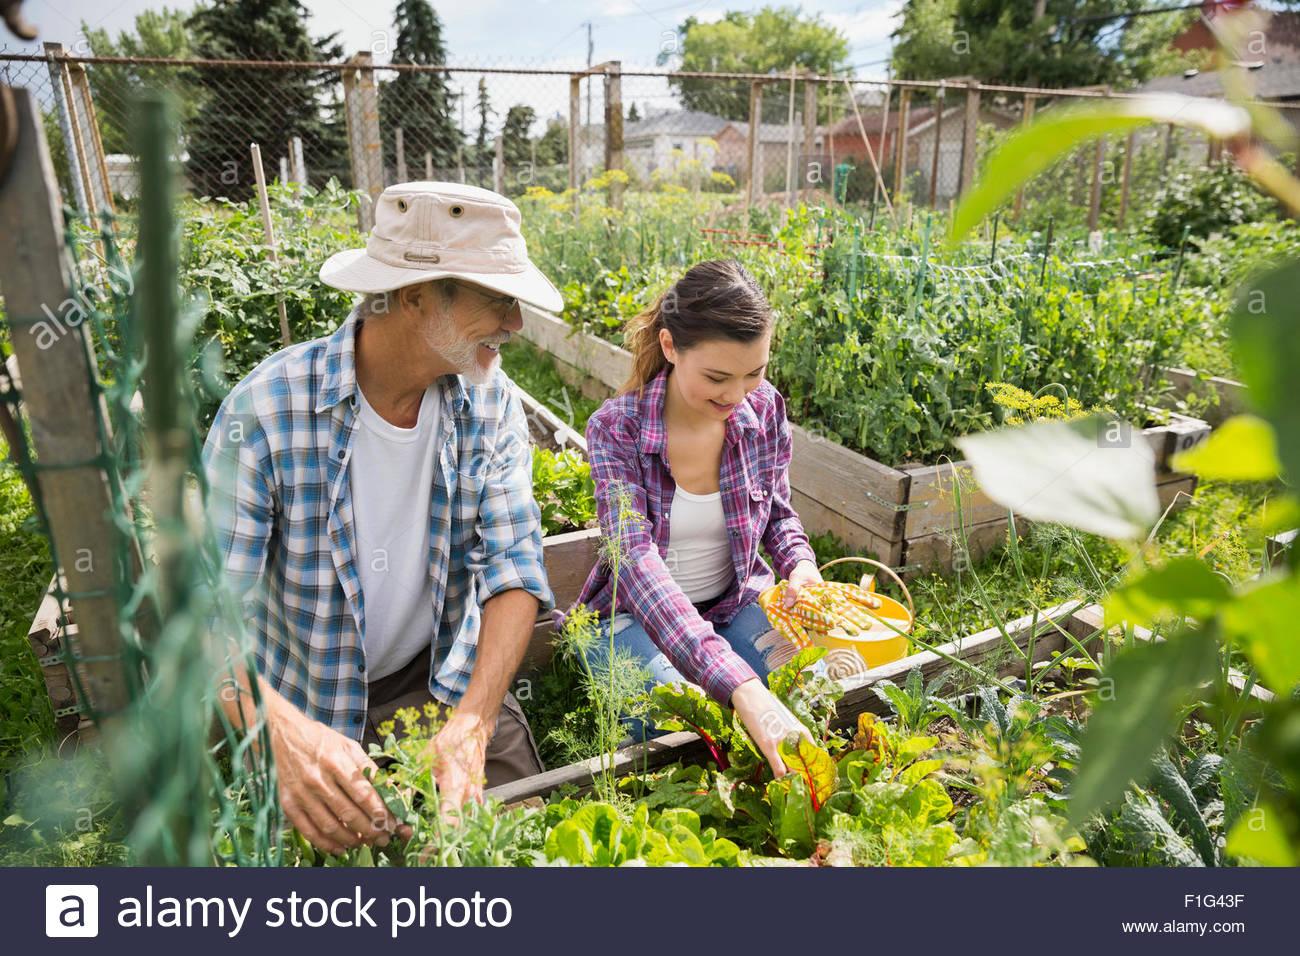 Vater und Tochter tendenziell Gemüsegarten Stockbild